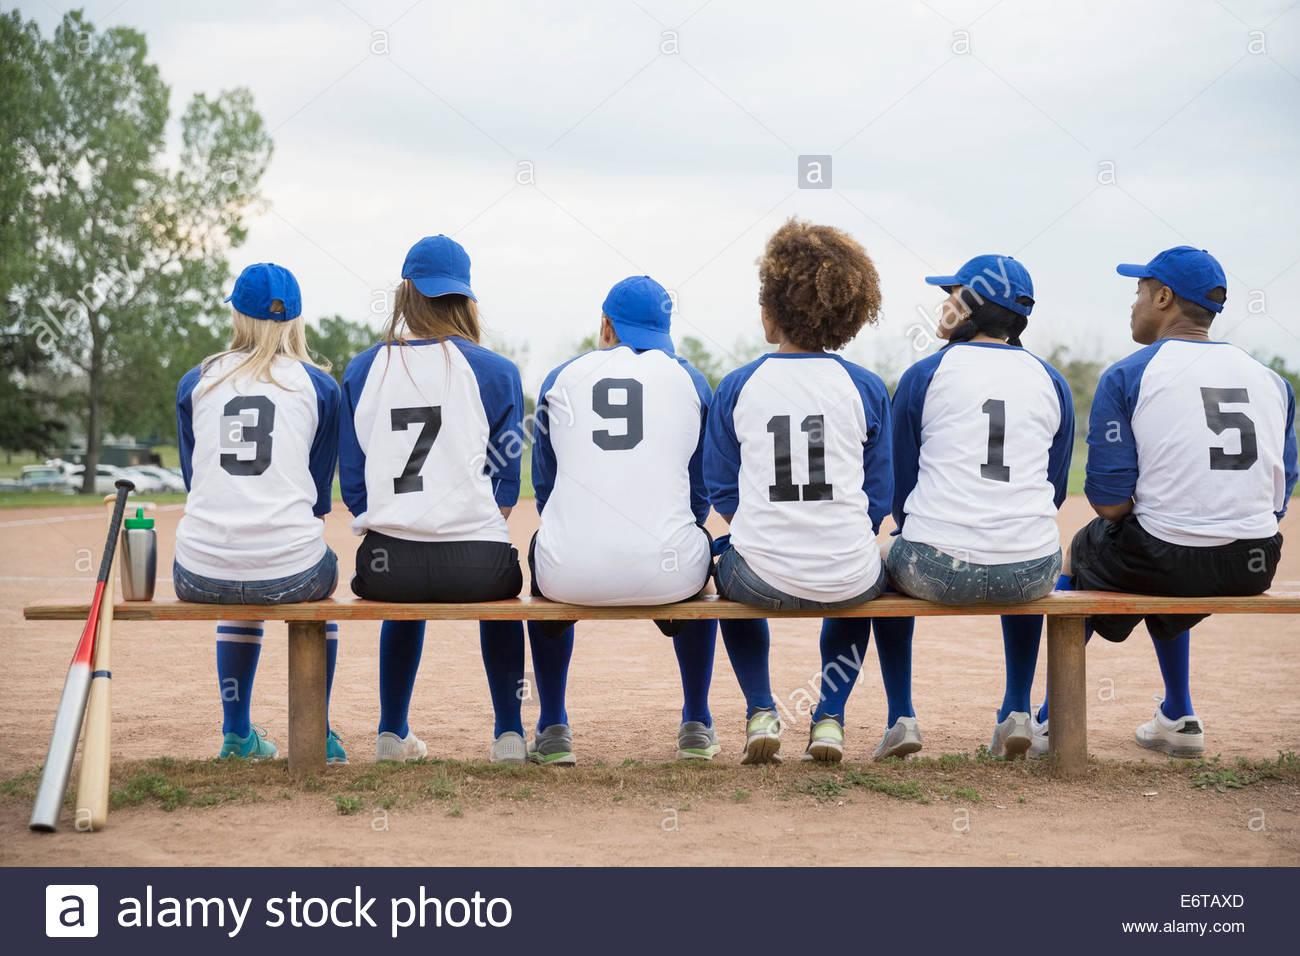 sunshine image royalty free baseball bench stock photography warmers of